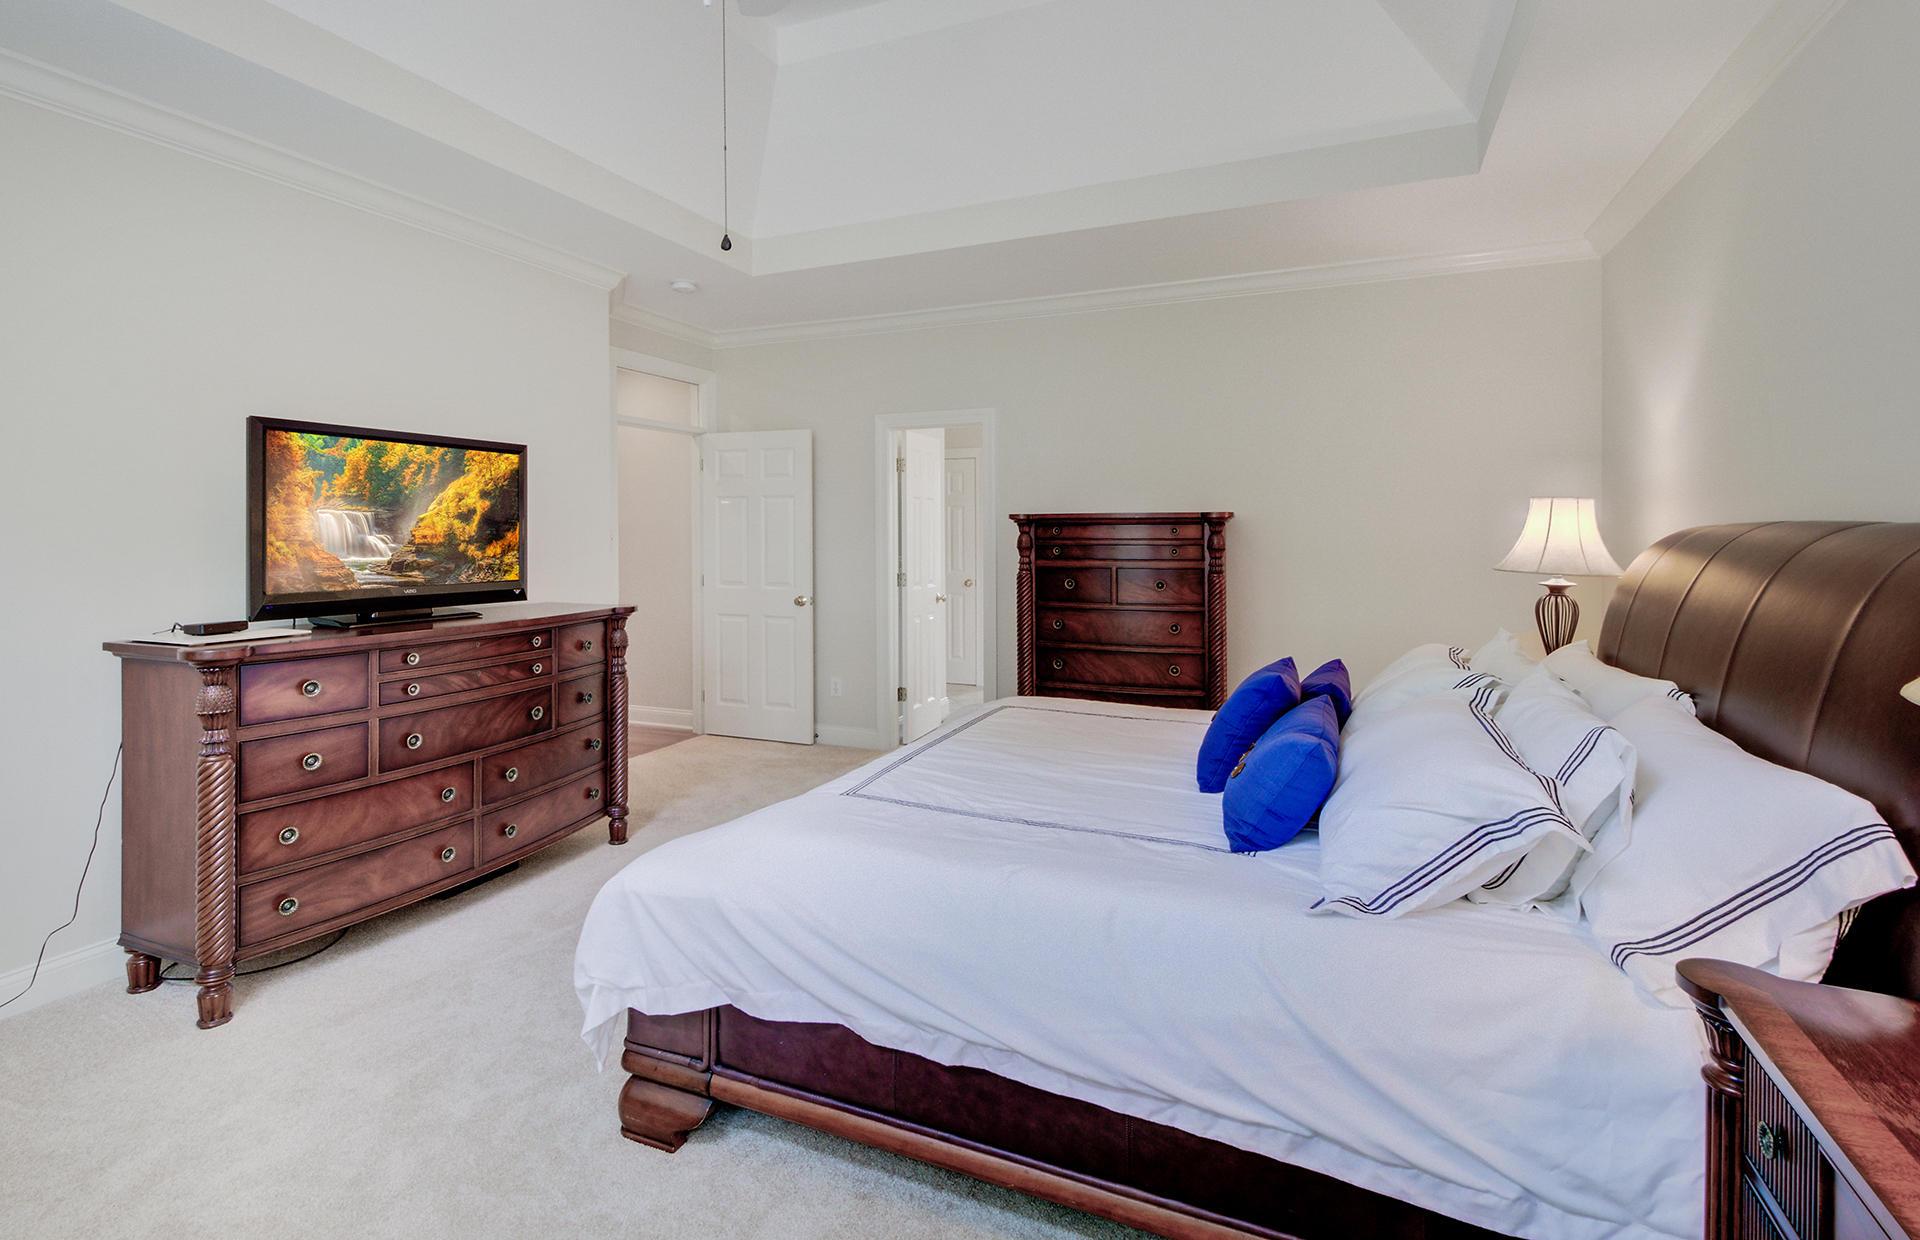 Dunes West Homes For Sale - 2453 Darts Cove, Mount Pleasant, SC - 35